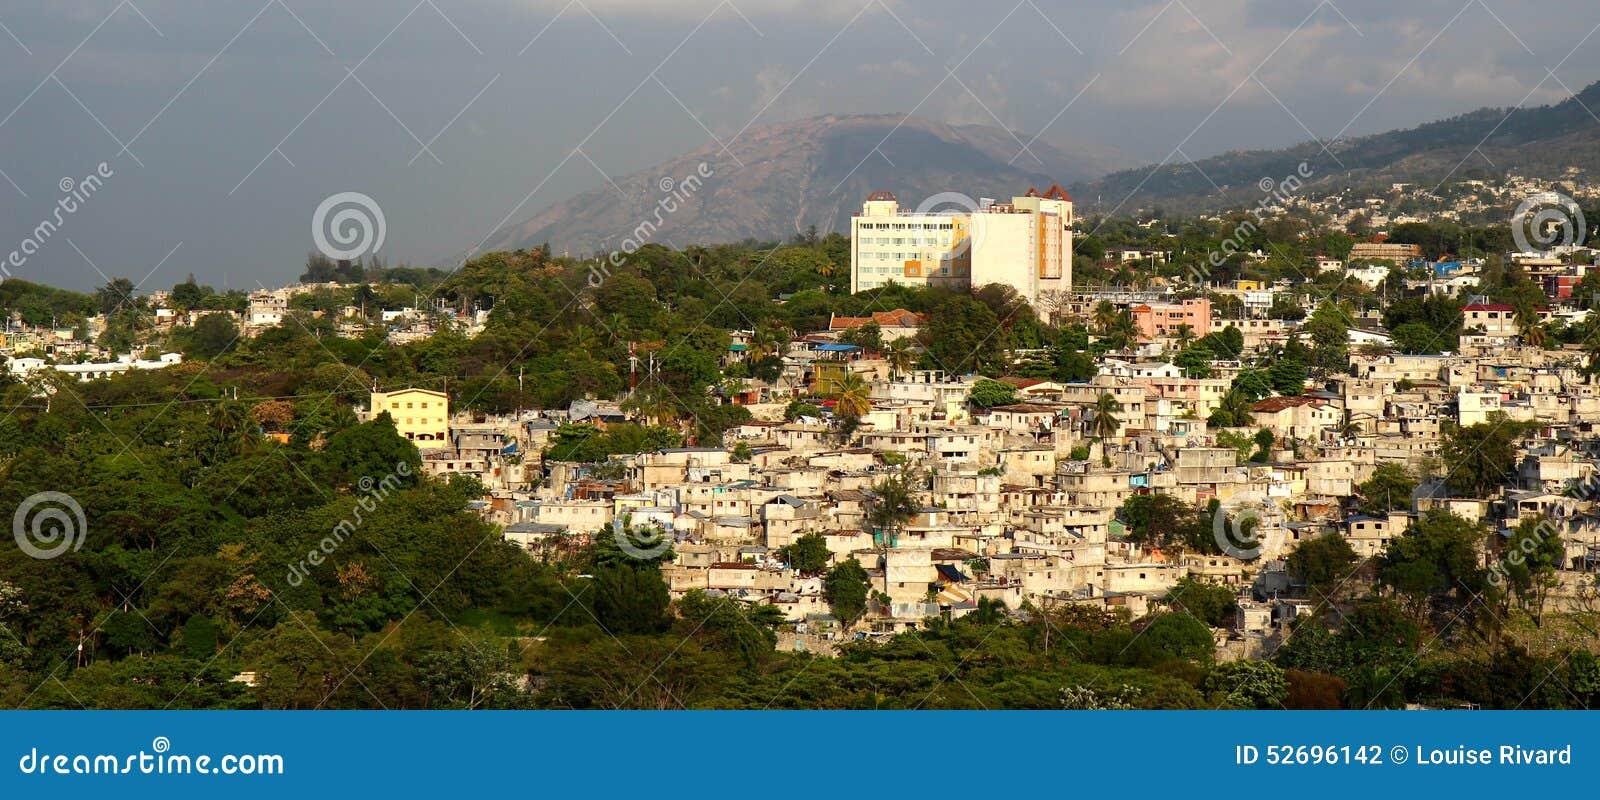 Port-au-Prince domy